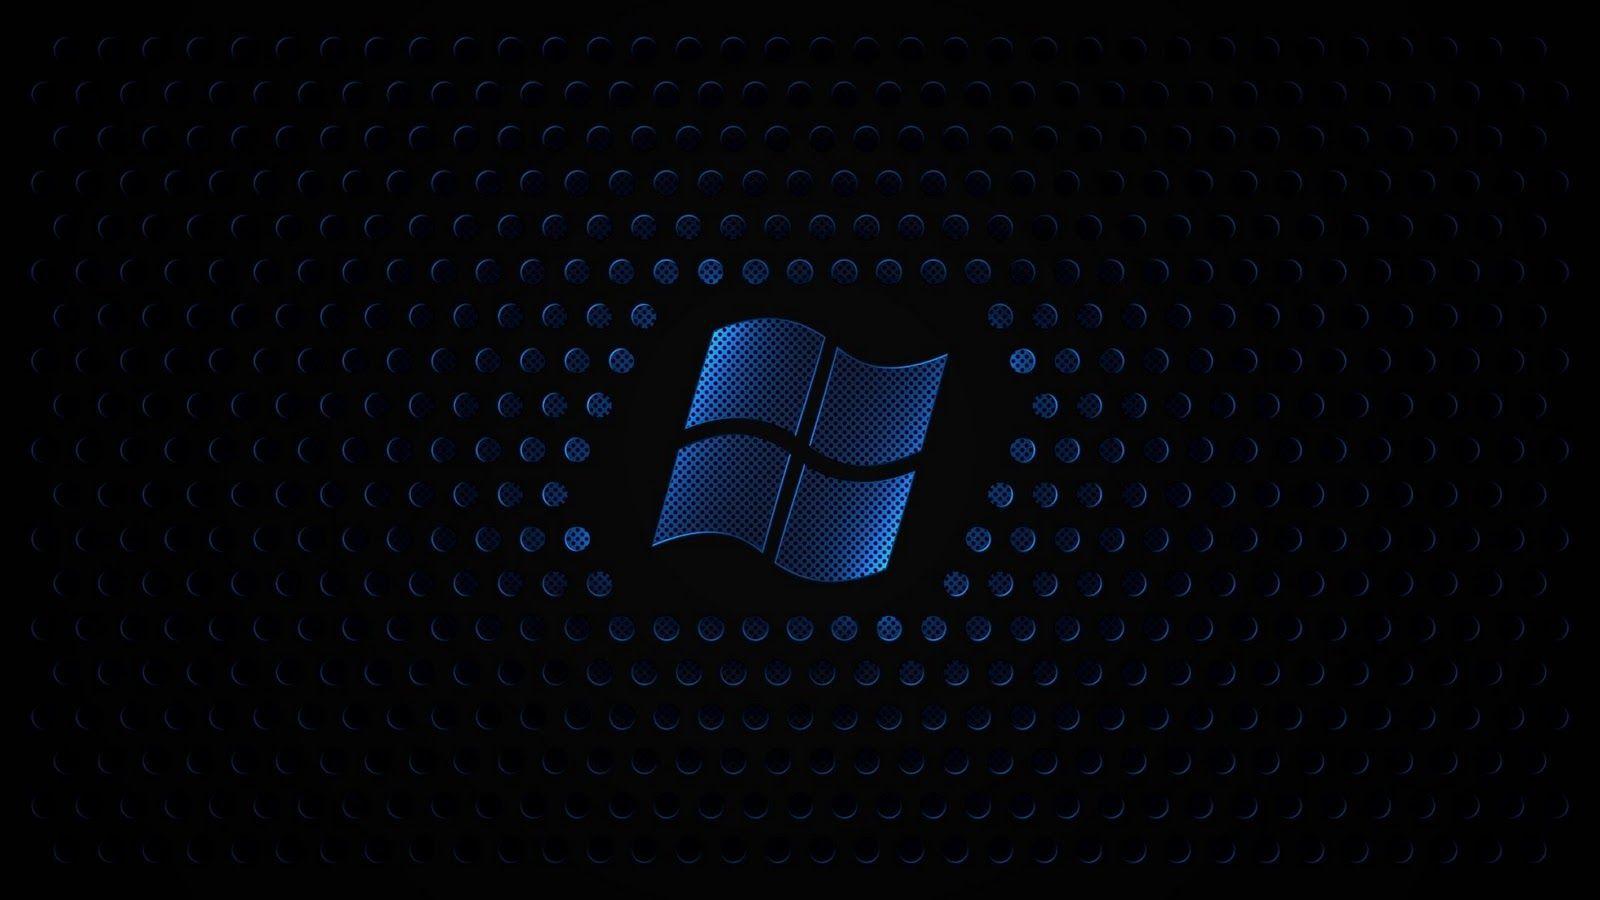 Glow In The Dark Wallpaper Free Download R Wallpapers Hd Windows Wallpaper Black And Blue Background Black Hd Wallpaper